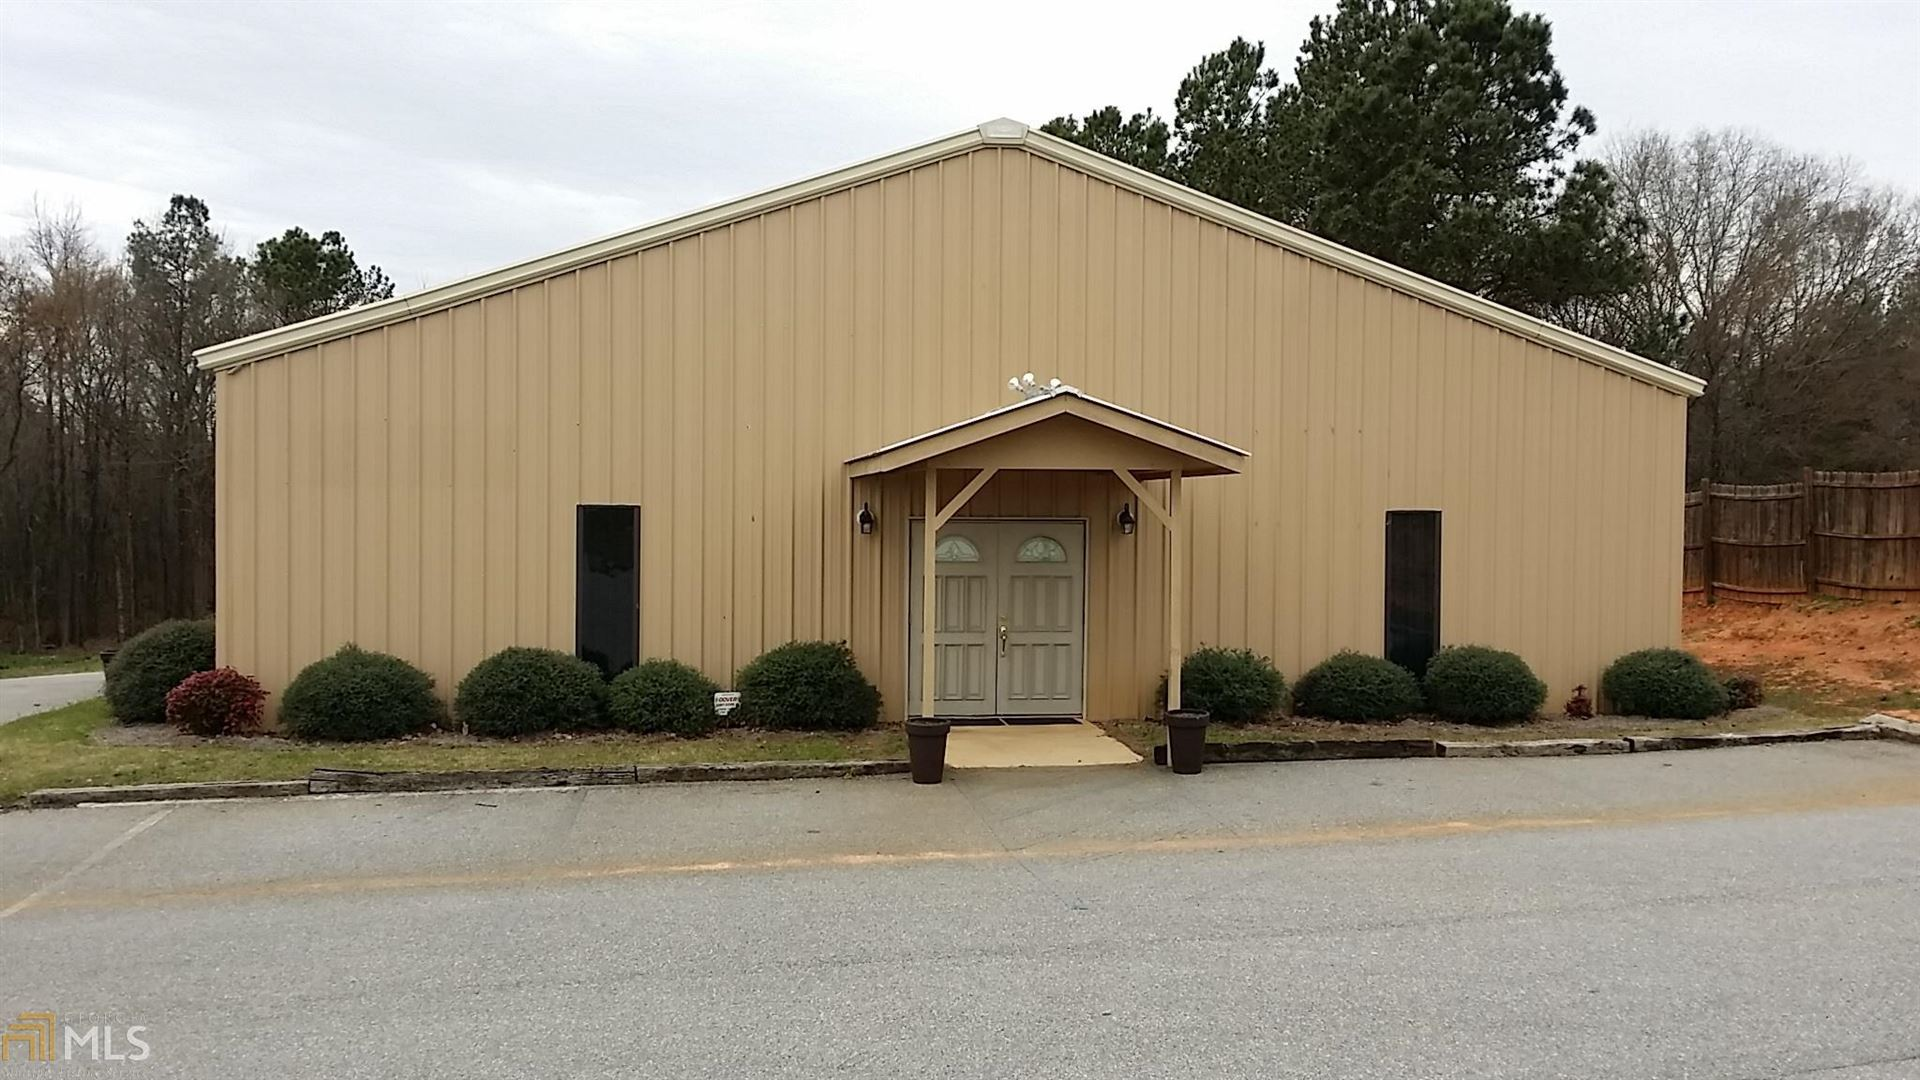 Photo for 714 Washington Rd (Hwy 78), Lexington, GA 30648 (MLS # 8577172)